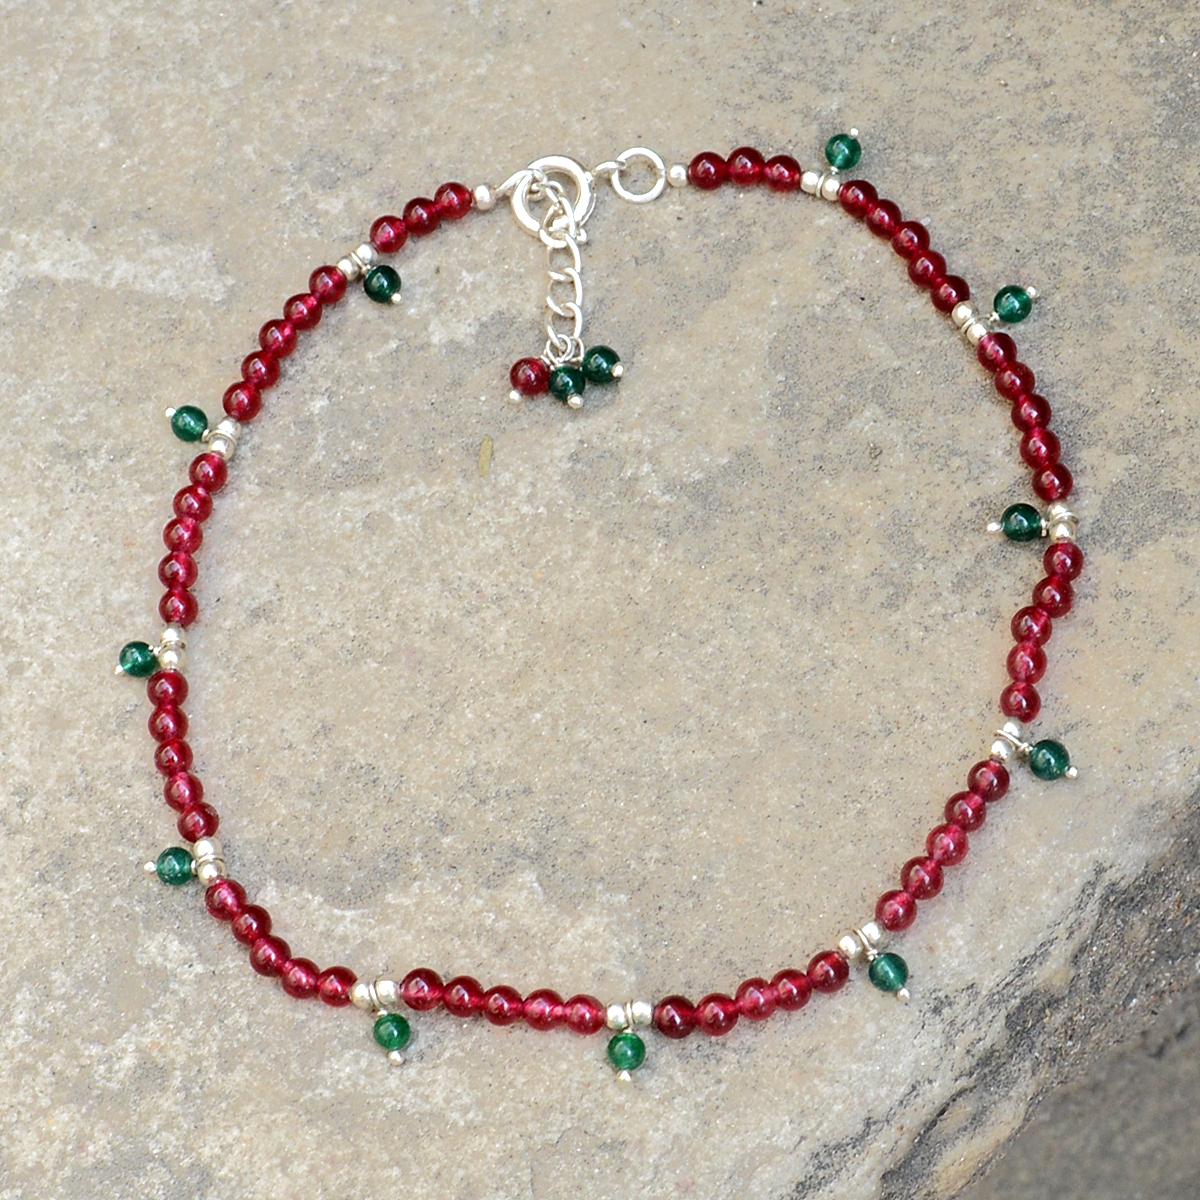 Pink & Green Quartz Stone Silver Anklet PG-156305